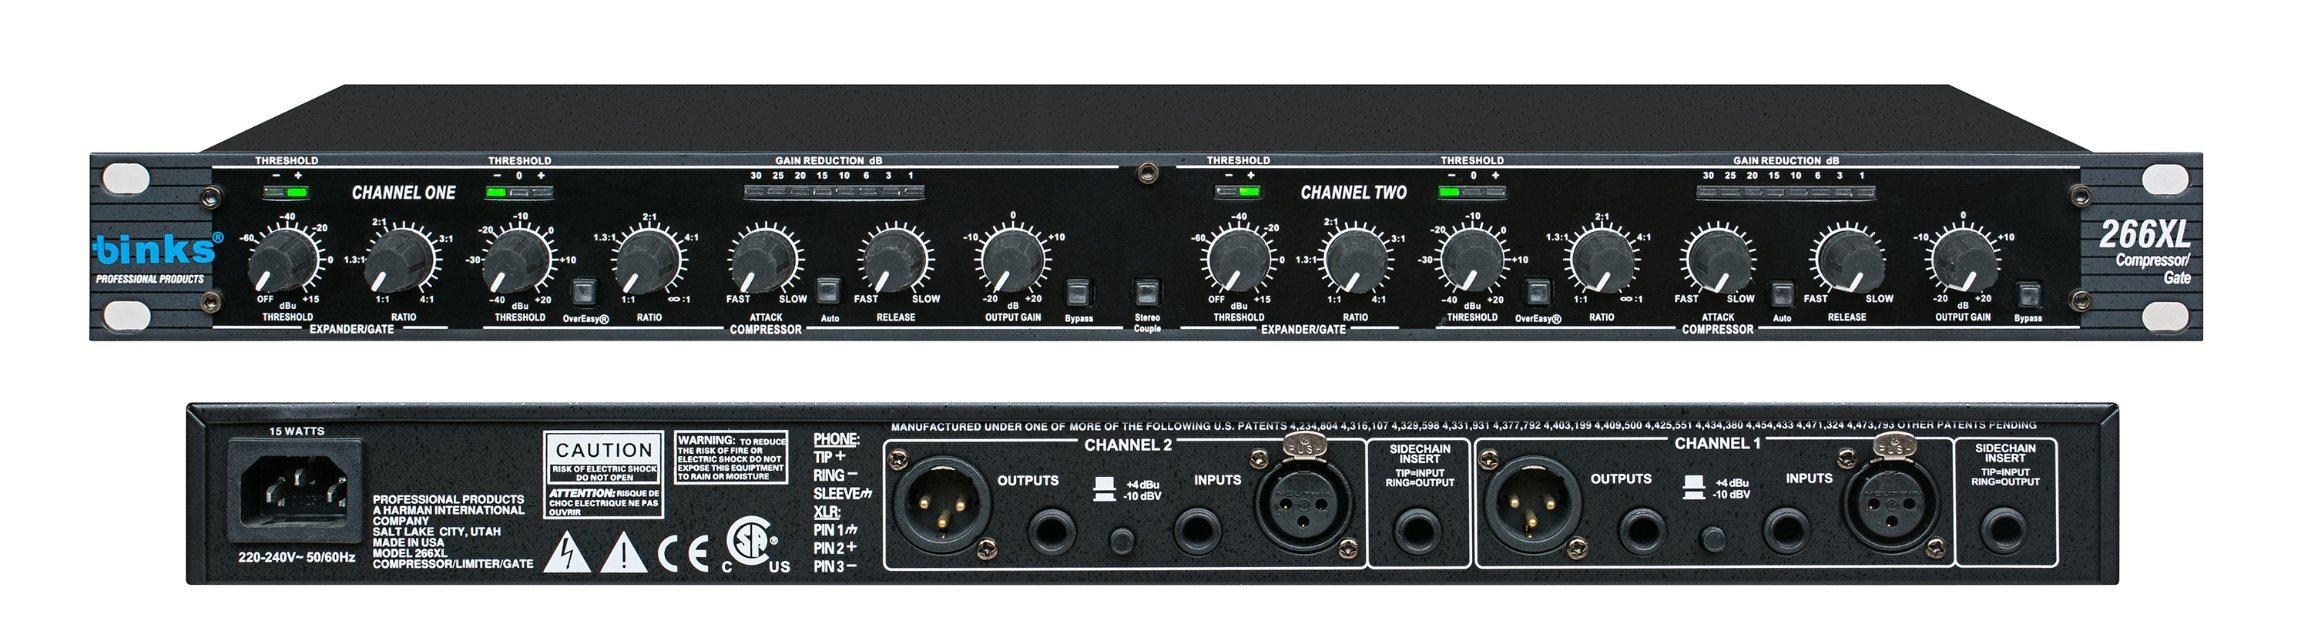 china 266xl professional audio compressor, audio limiter processorchina 266xl professional audio compressor, audio limiter processor china professional audio compressor, audio limiter processor